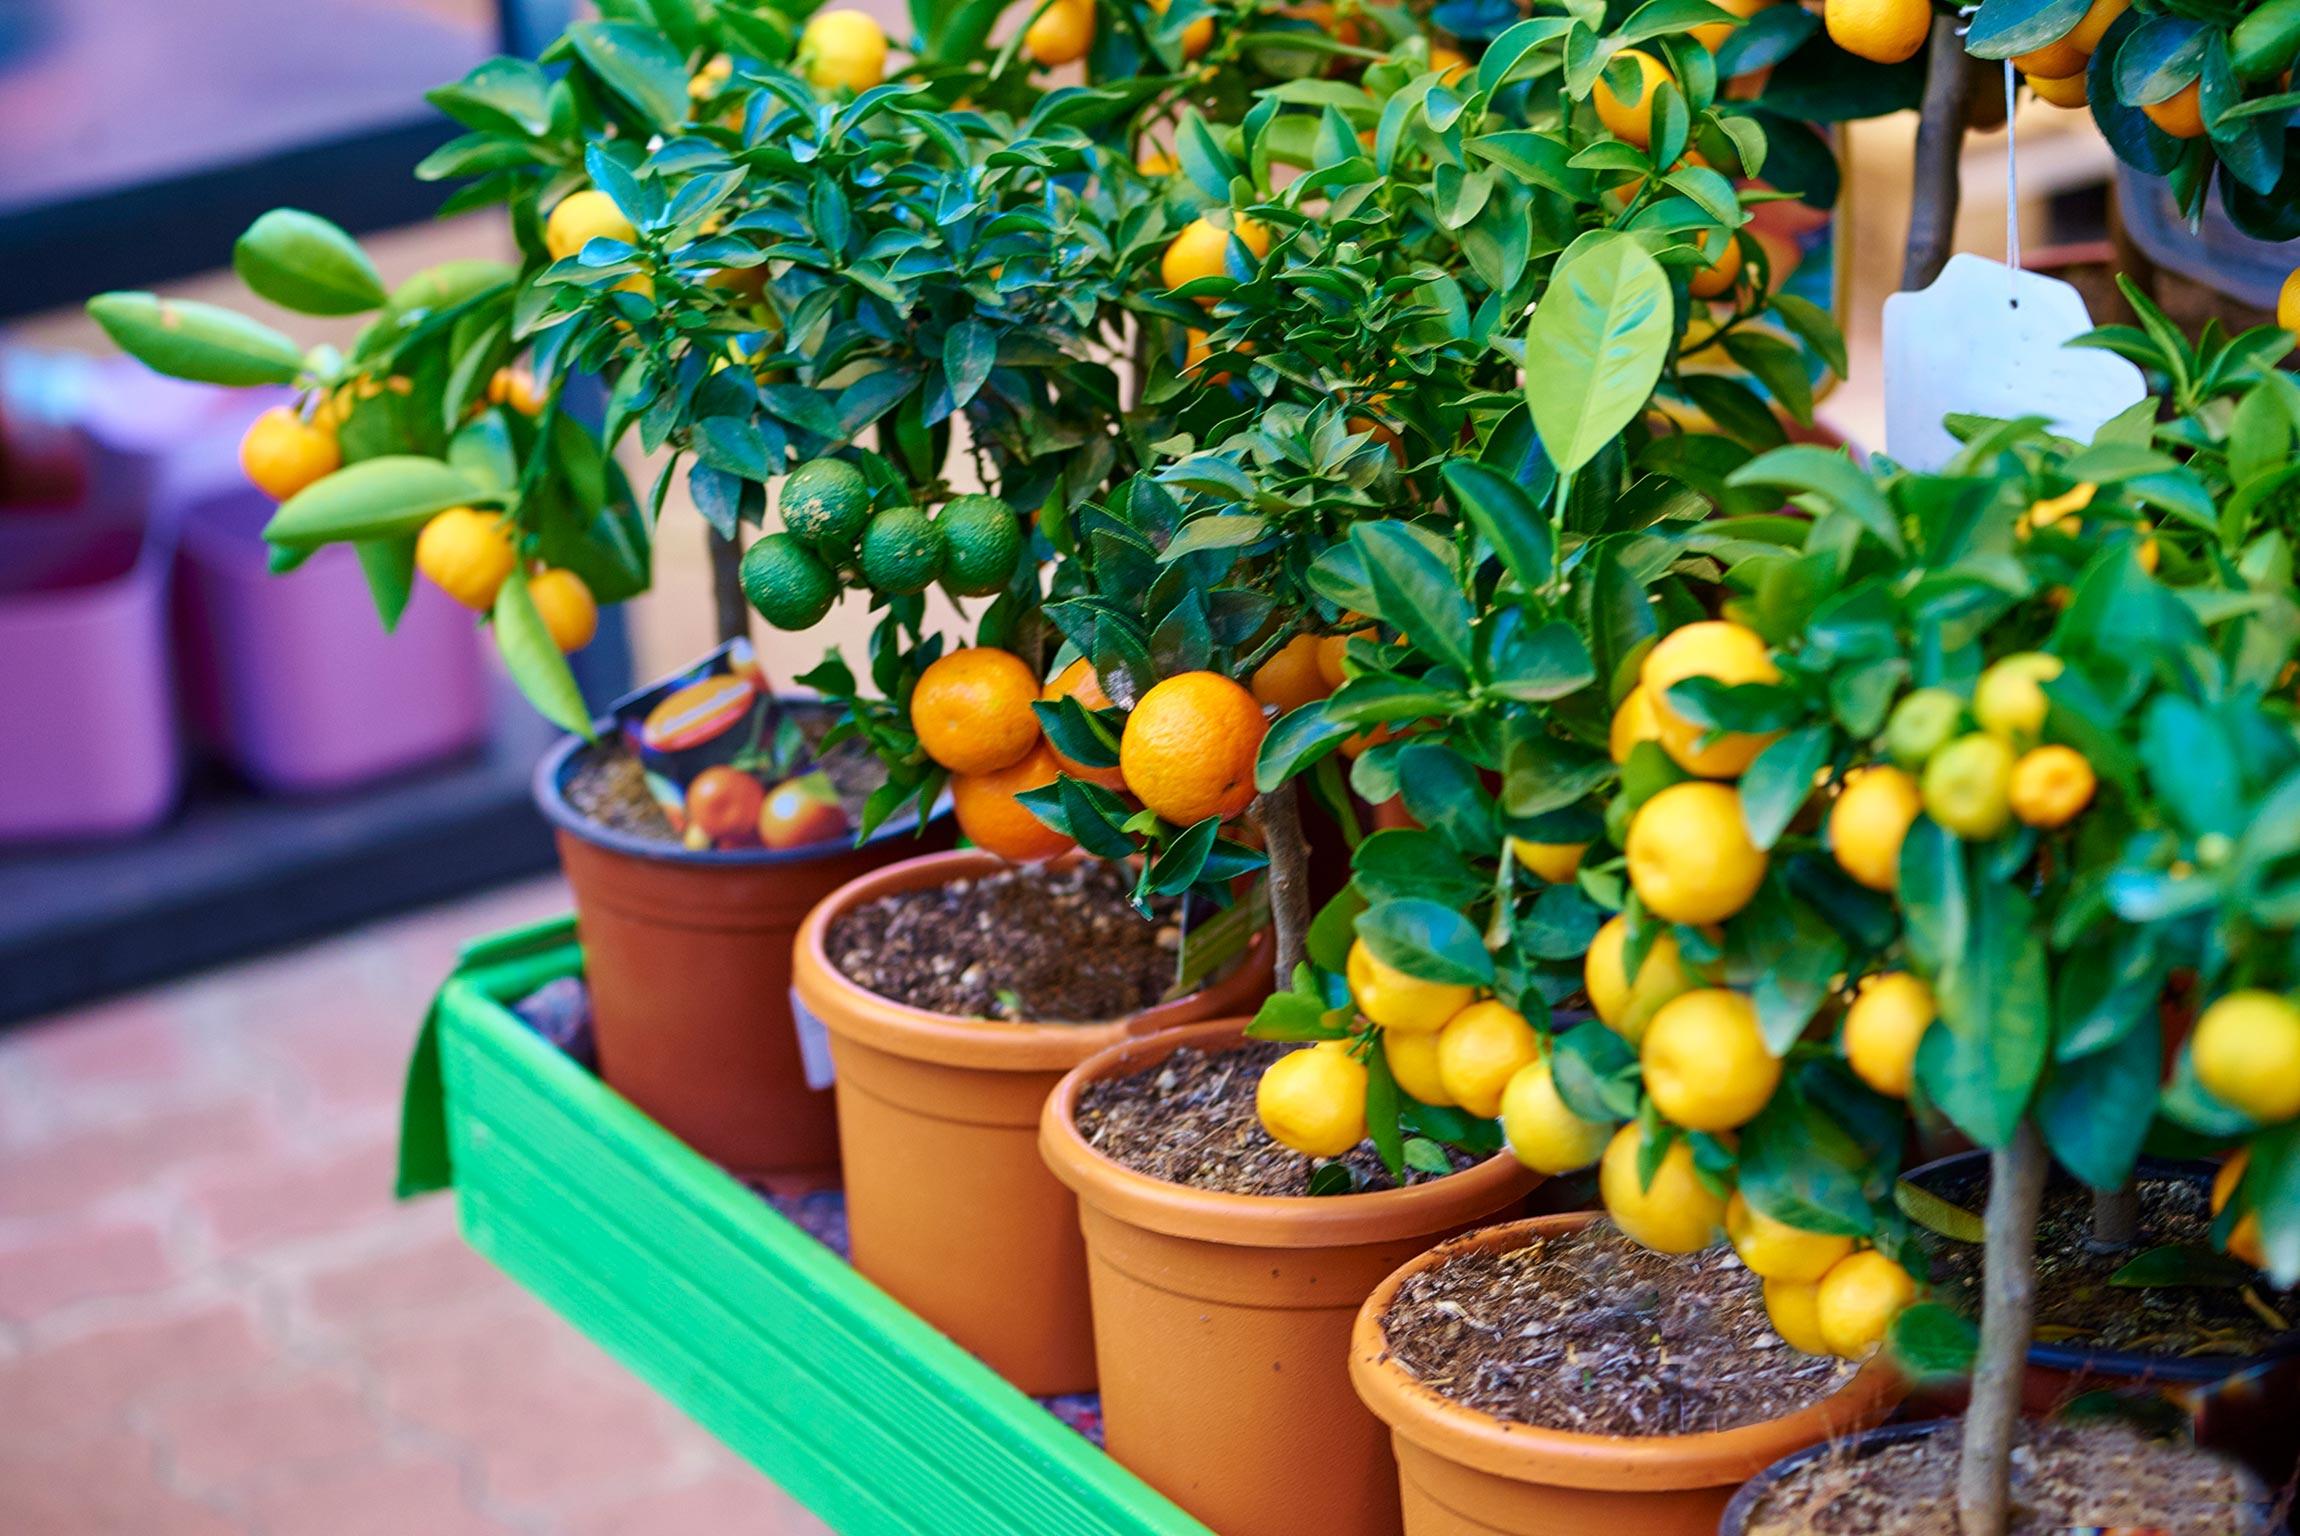 Edible Landscaping 15 Organizations Creating Edible